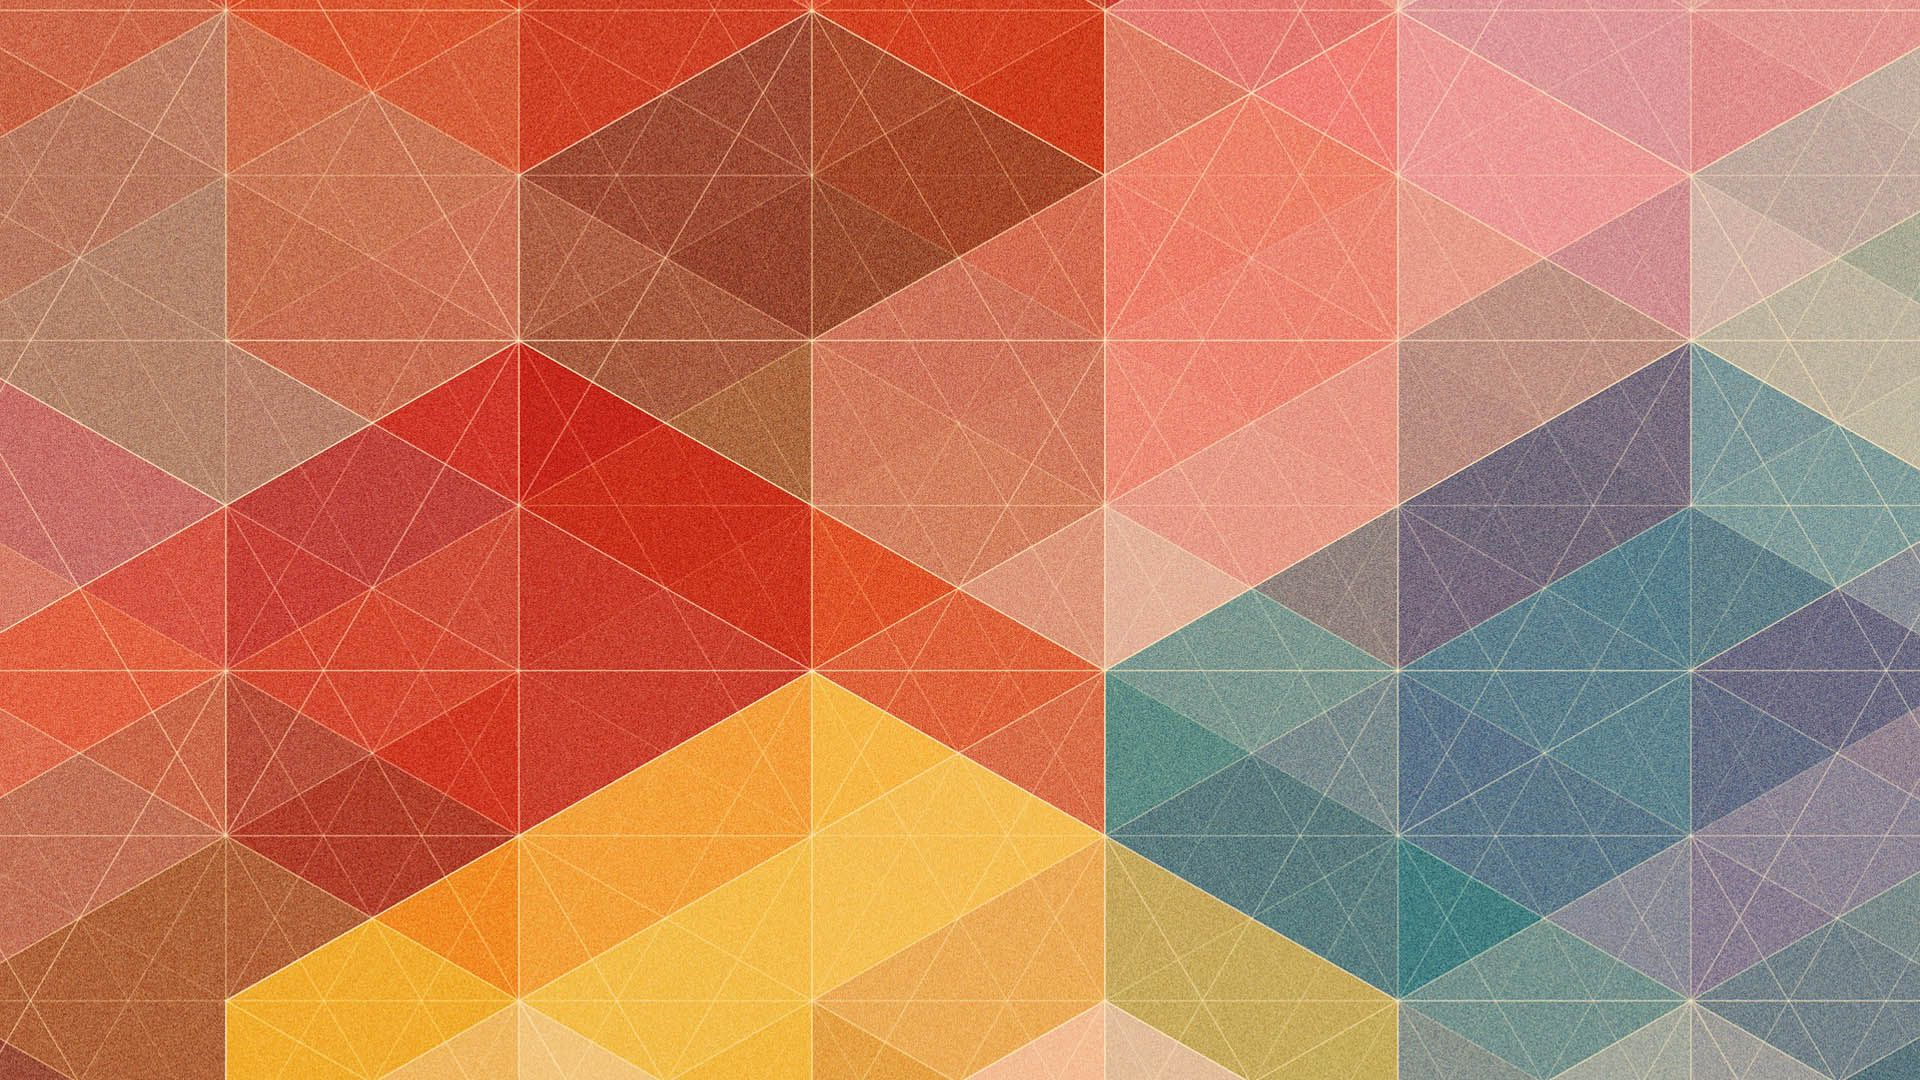 Hd Red Geometric Geometry Design Wallpaper For Desktop Full Size Geometric Pattern Wallpaper Polygon Pattern Abstract